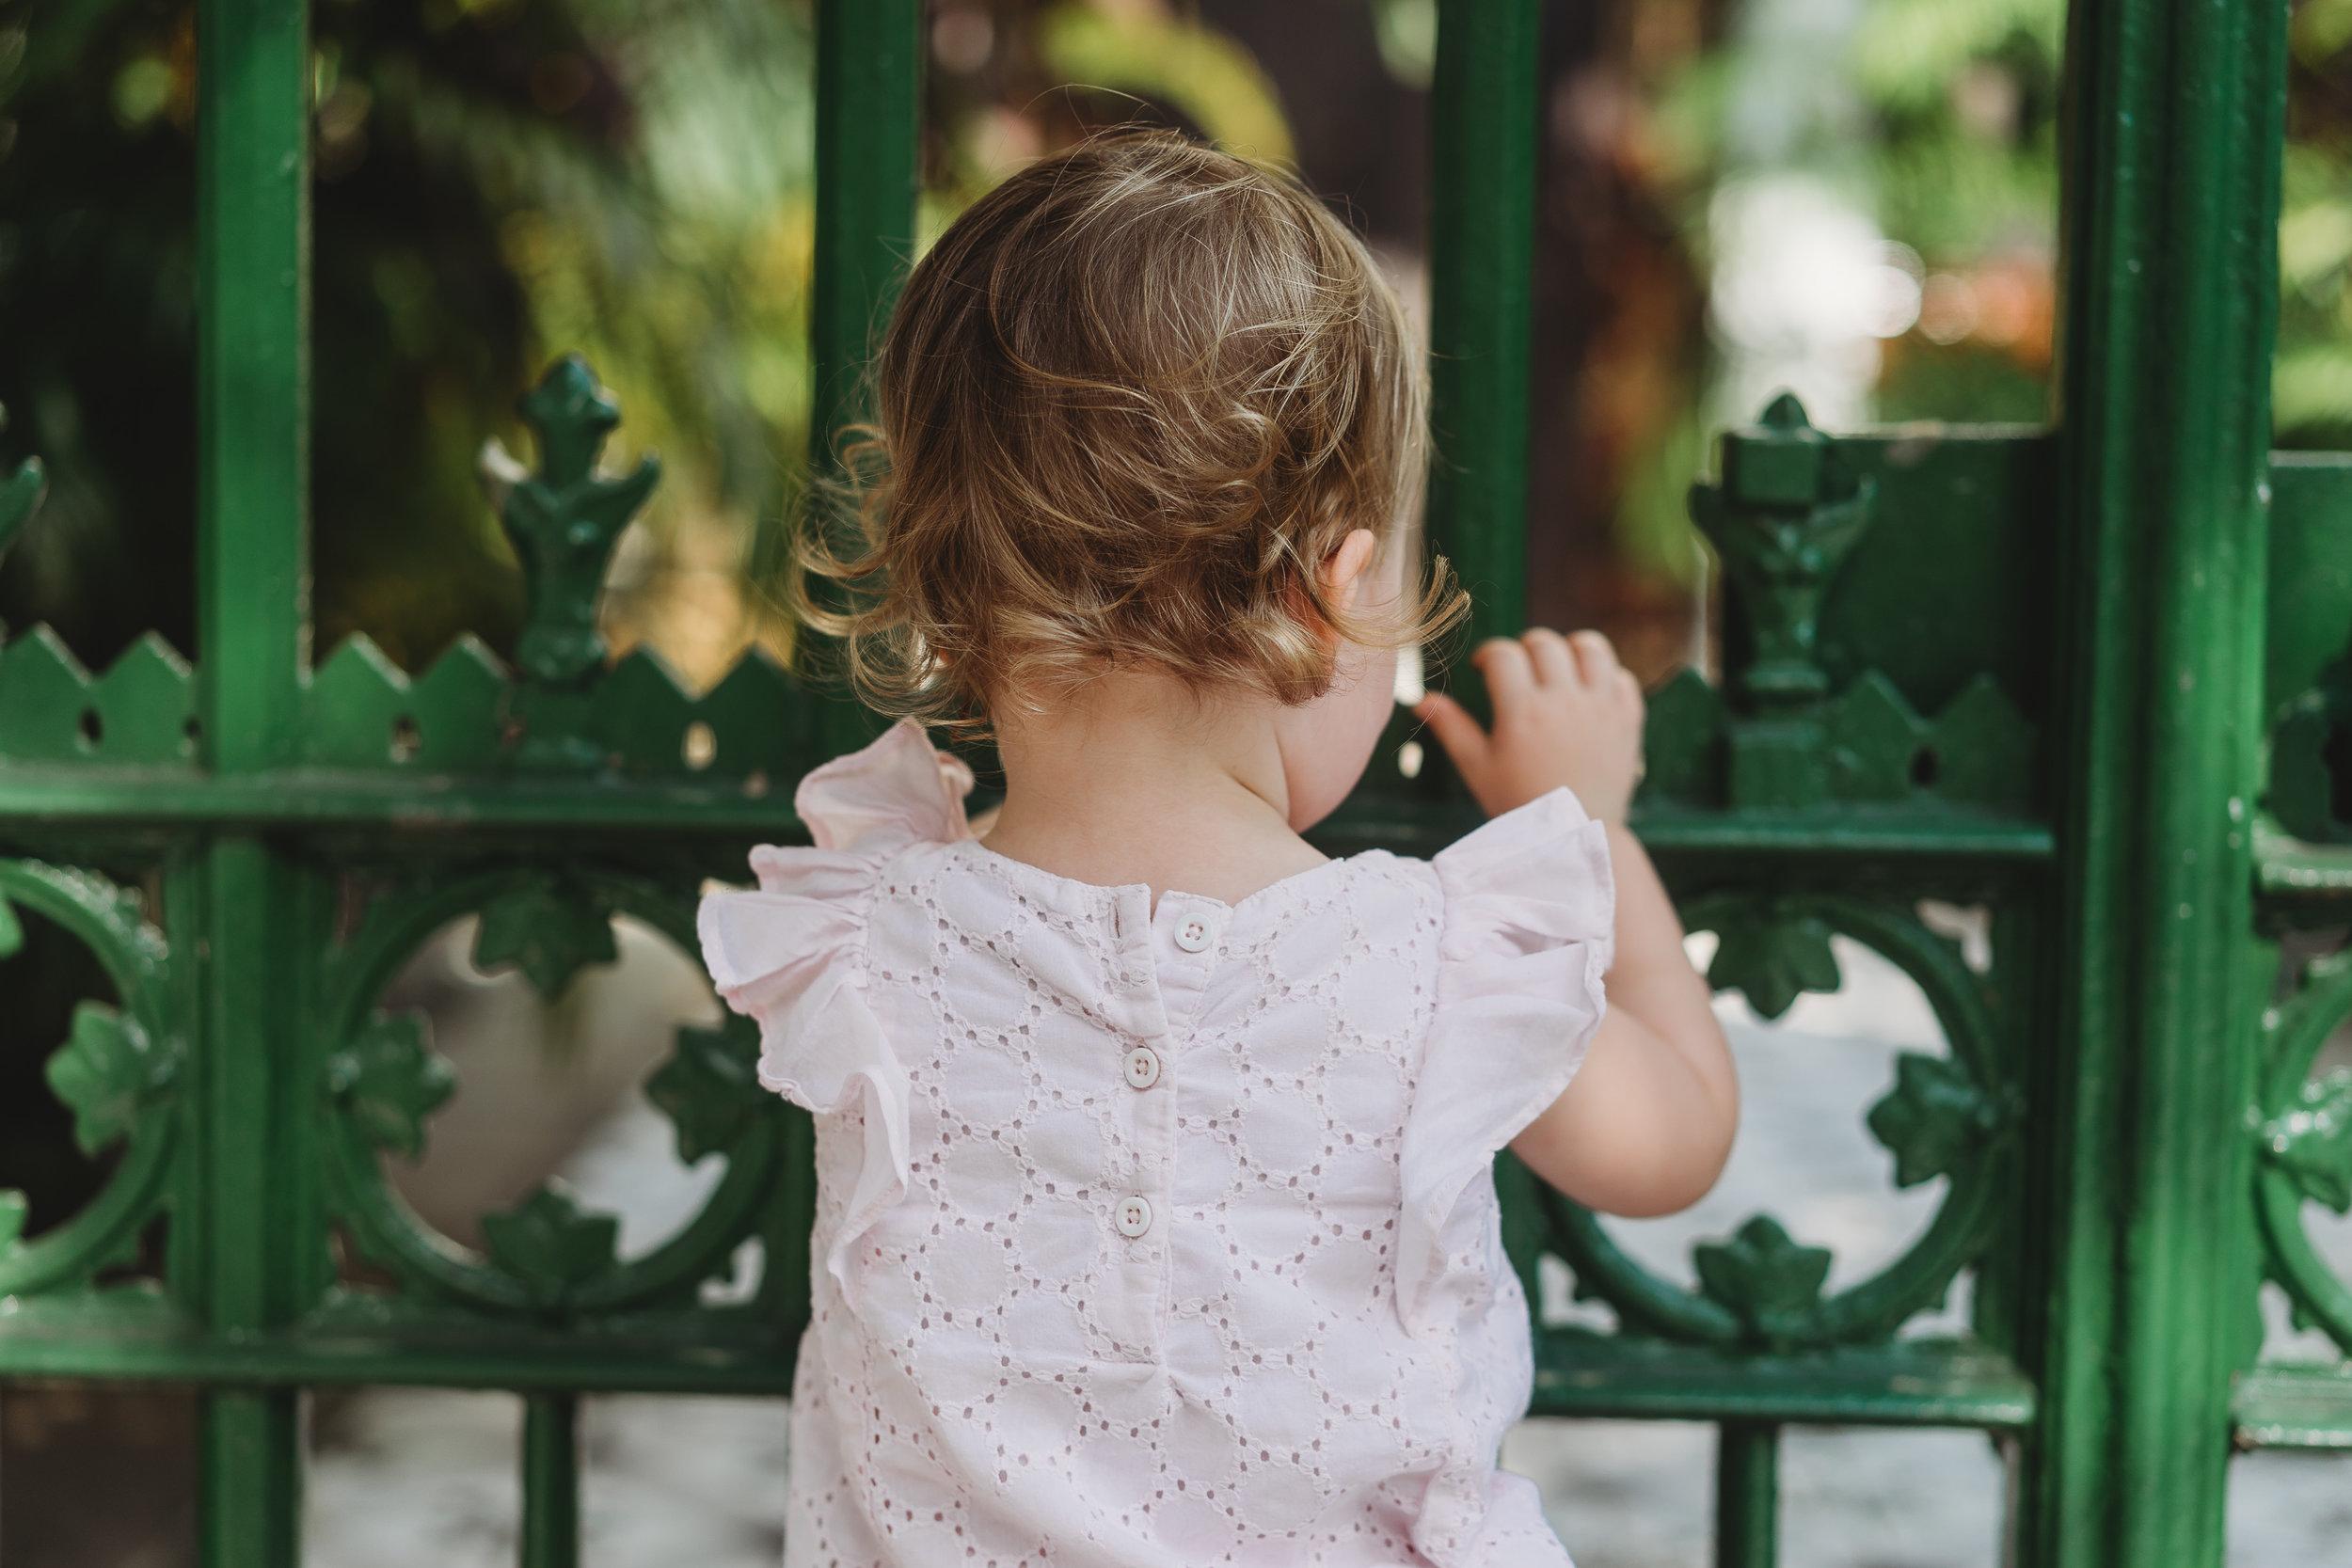 Lisa-matthews-photography-child1.jpg